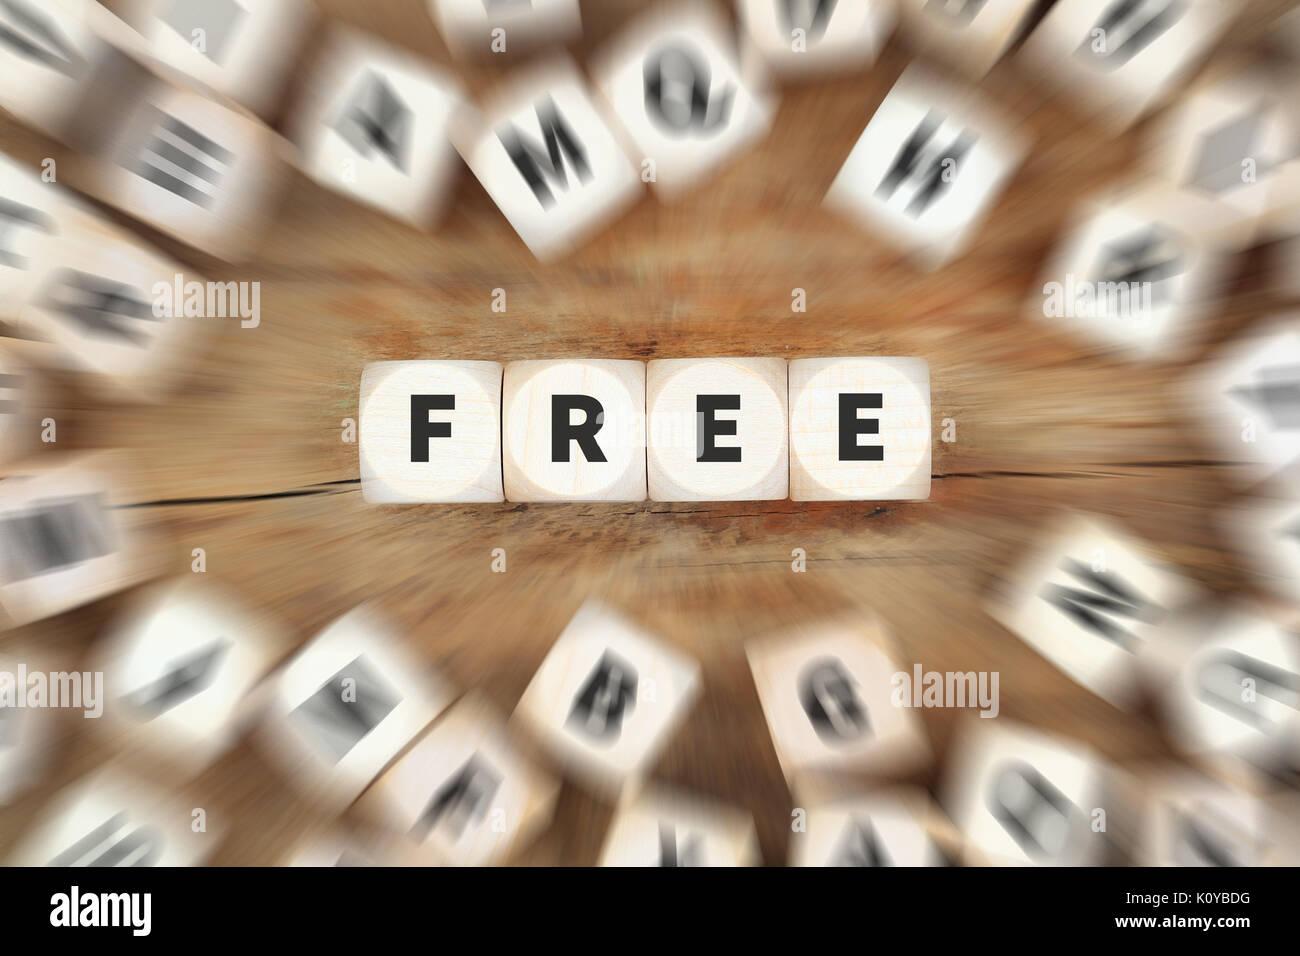 Oferta gratuita Descarga Voucher nuevo envío entrega regalo dados concepto empresarial Imagen De Stock